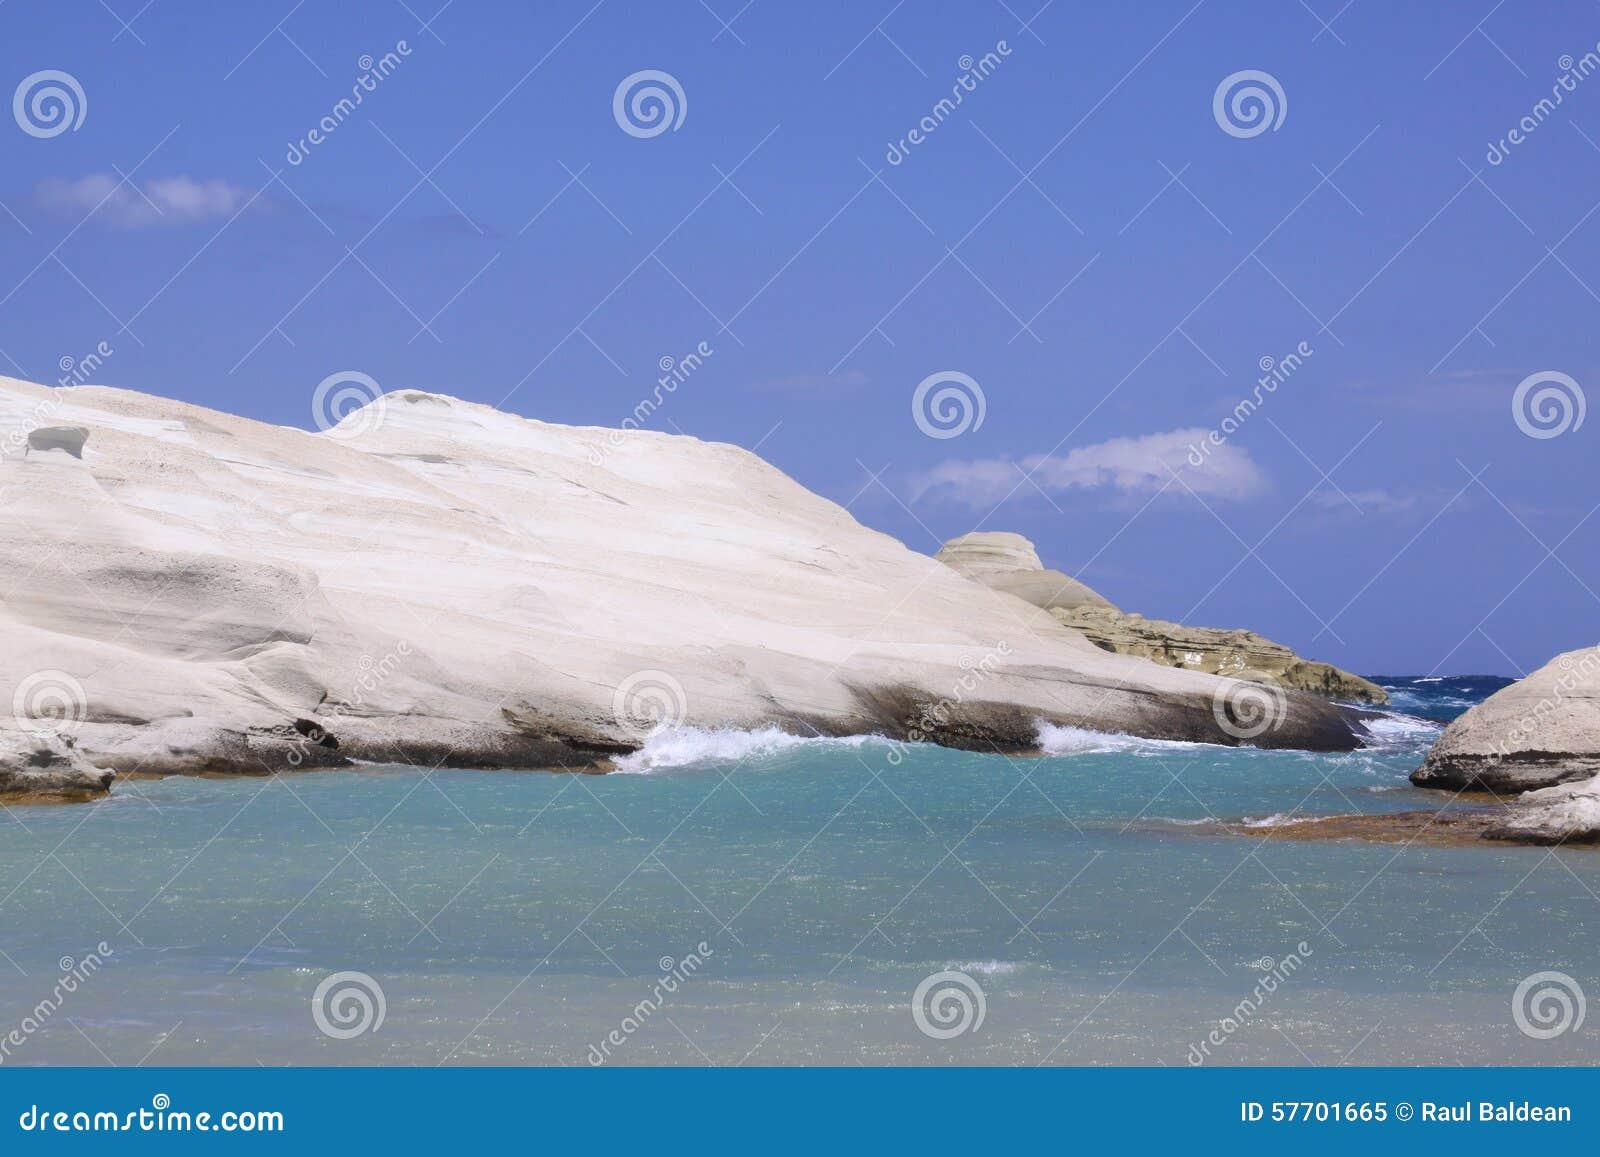 Sarakiniko beach on Milos island 03